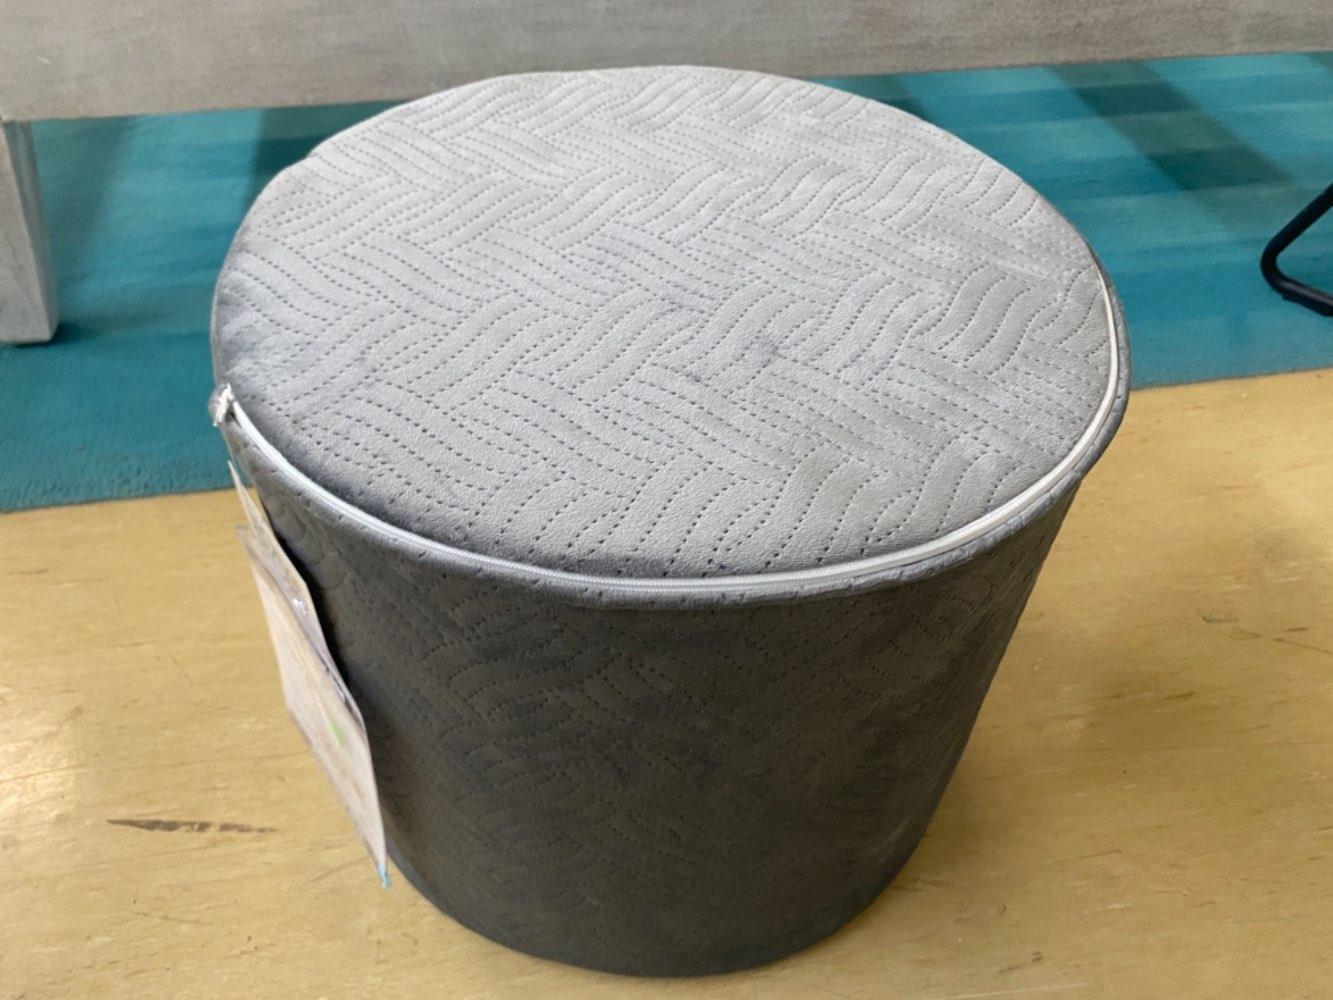 (MG) Sitzkissen / Sitzhocker / Hocker grau statt 50€